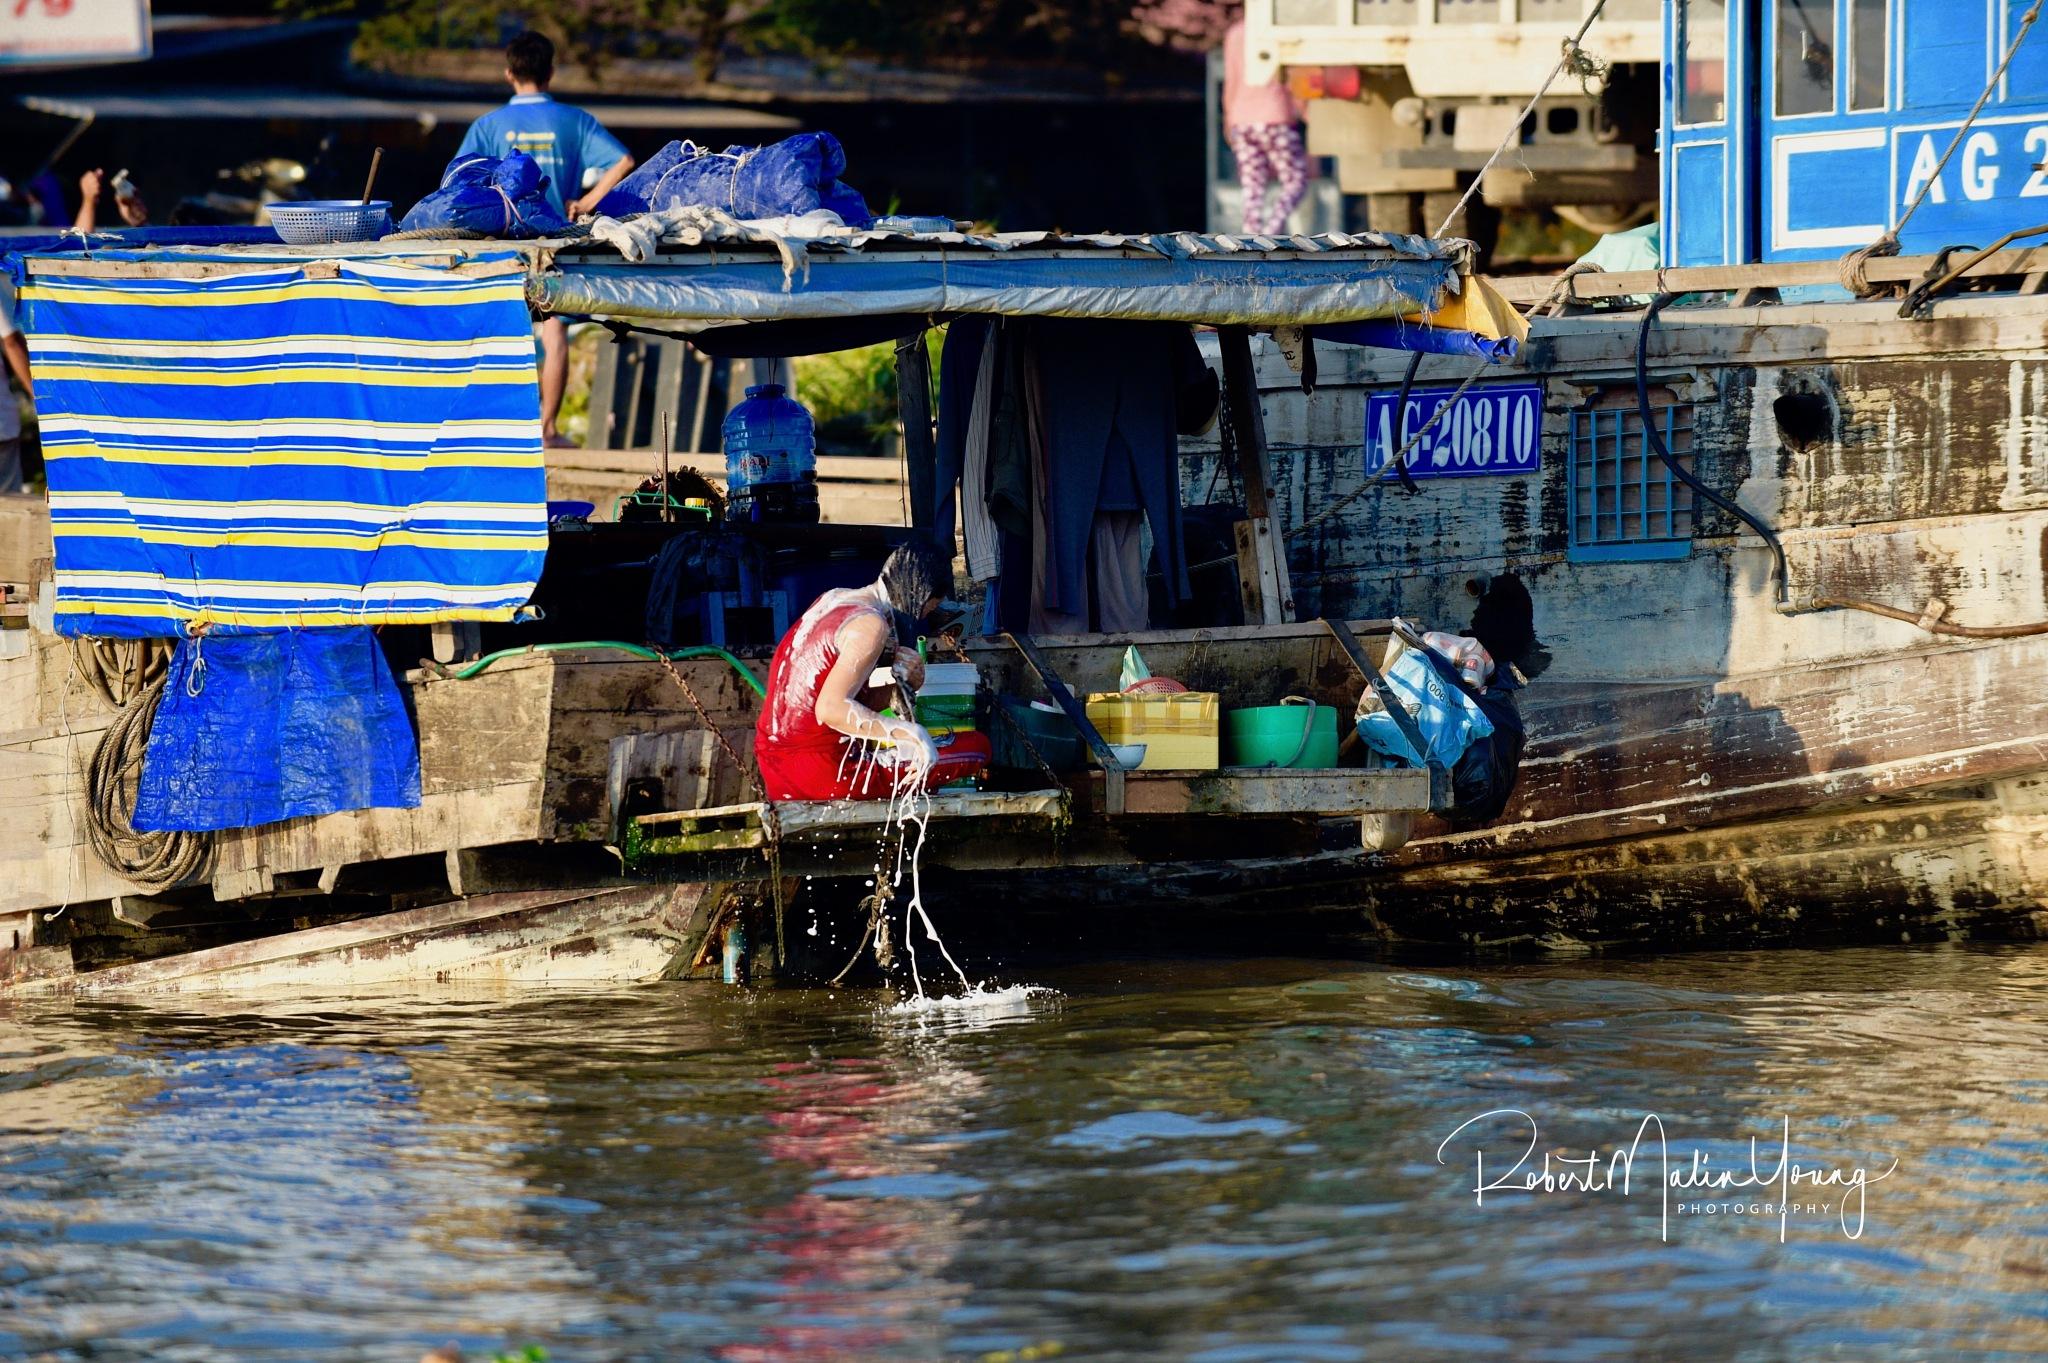 Up the Mekong - Viet Nam 2018 by Robert Malin Young